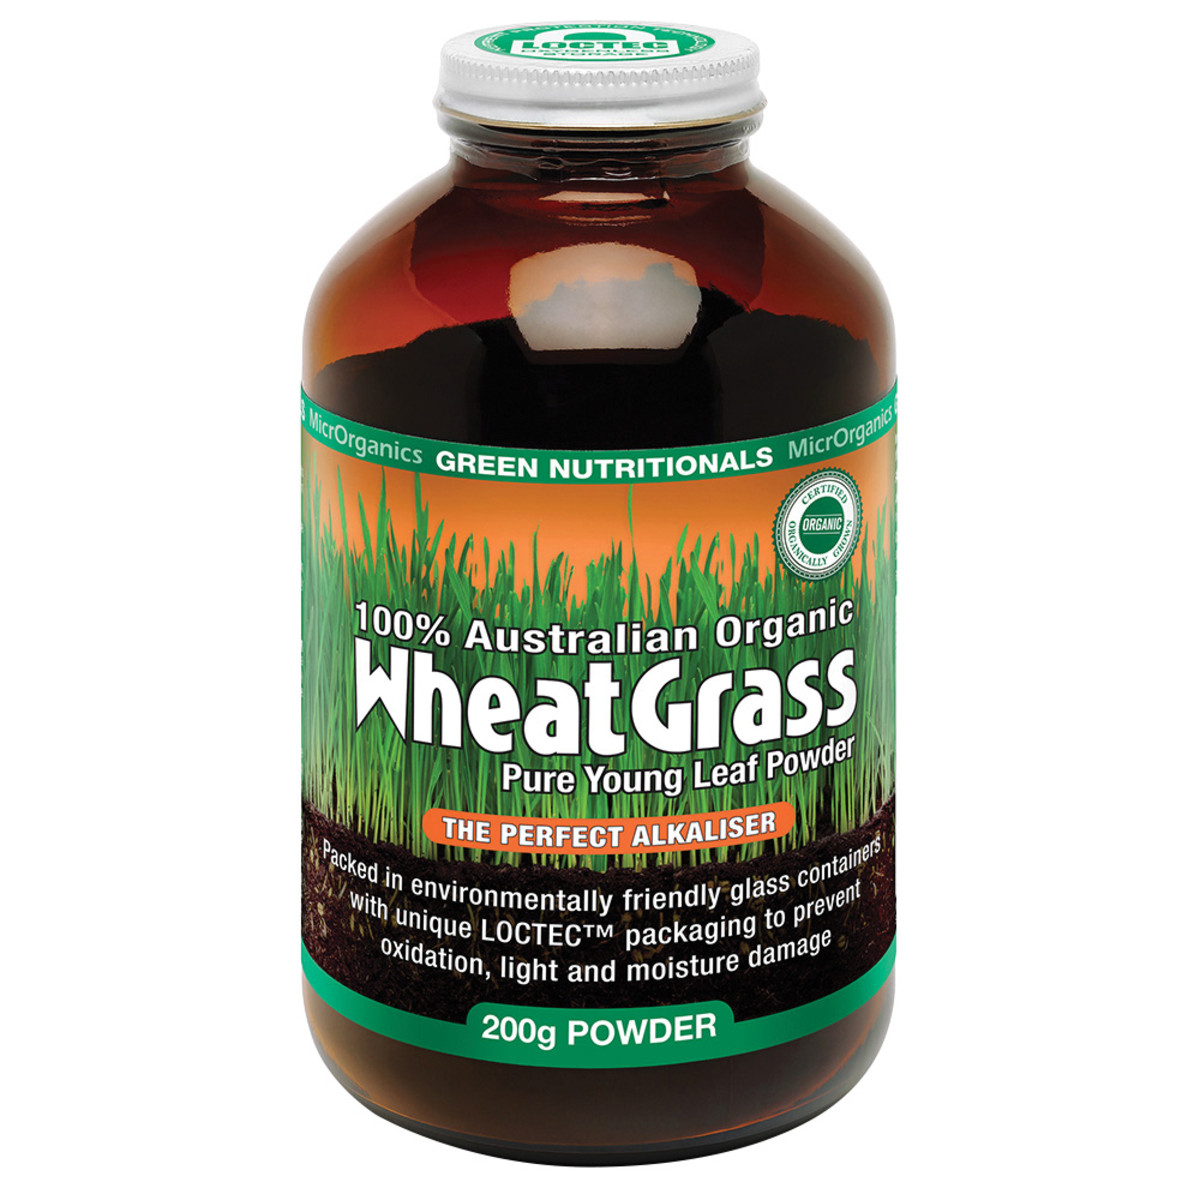 MICRORGANICS GREEN NUTRITIONALS WHEATGRASS 200G BONUS 25%